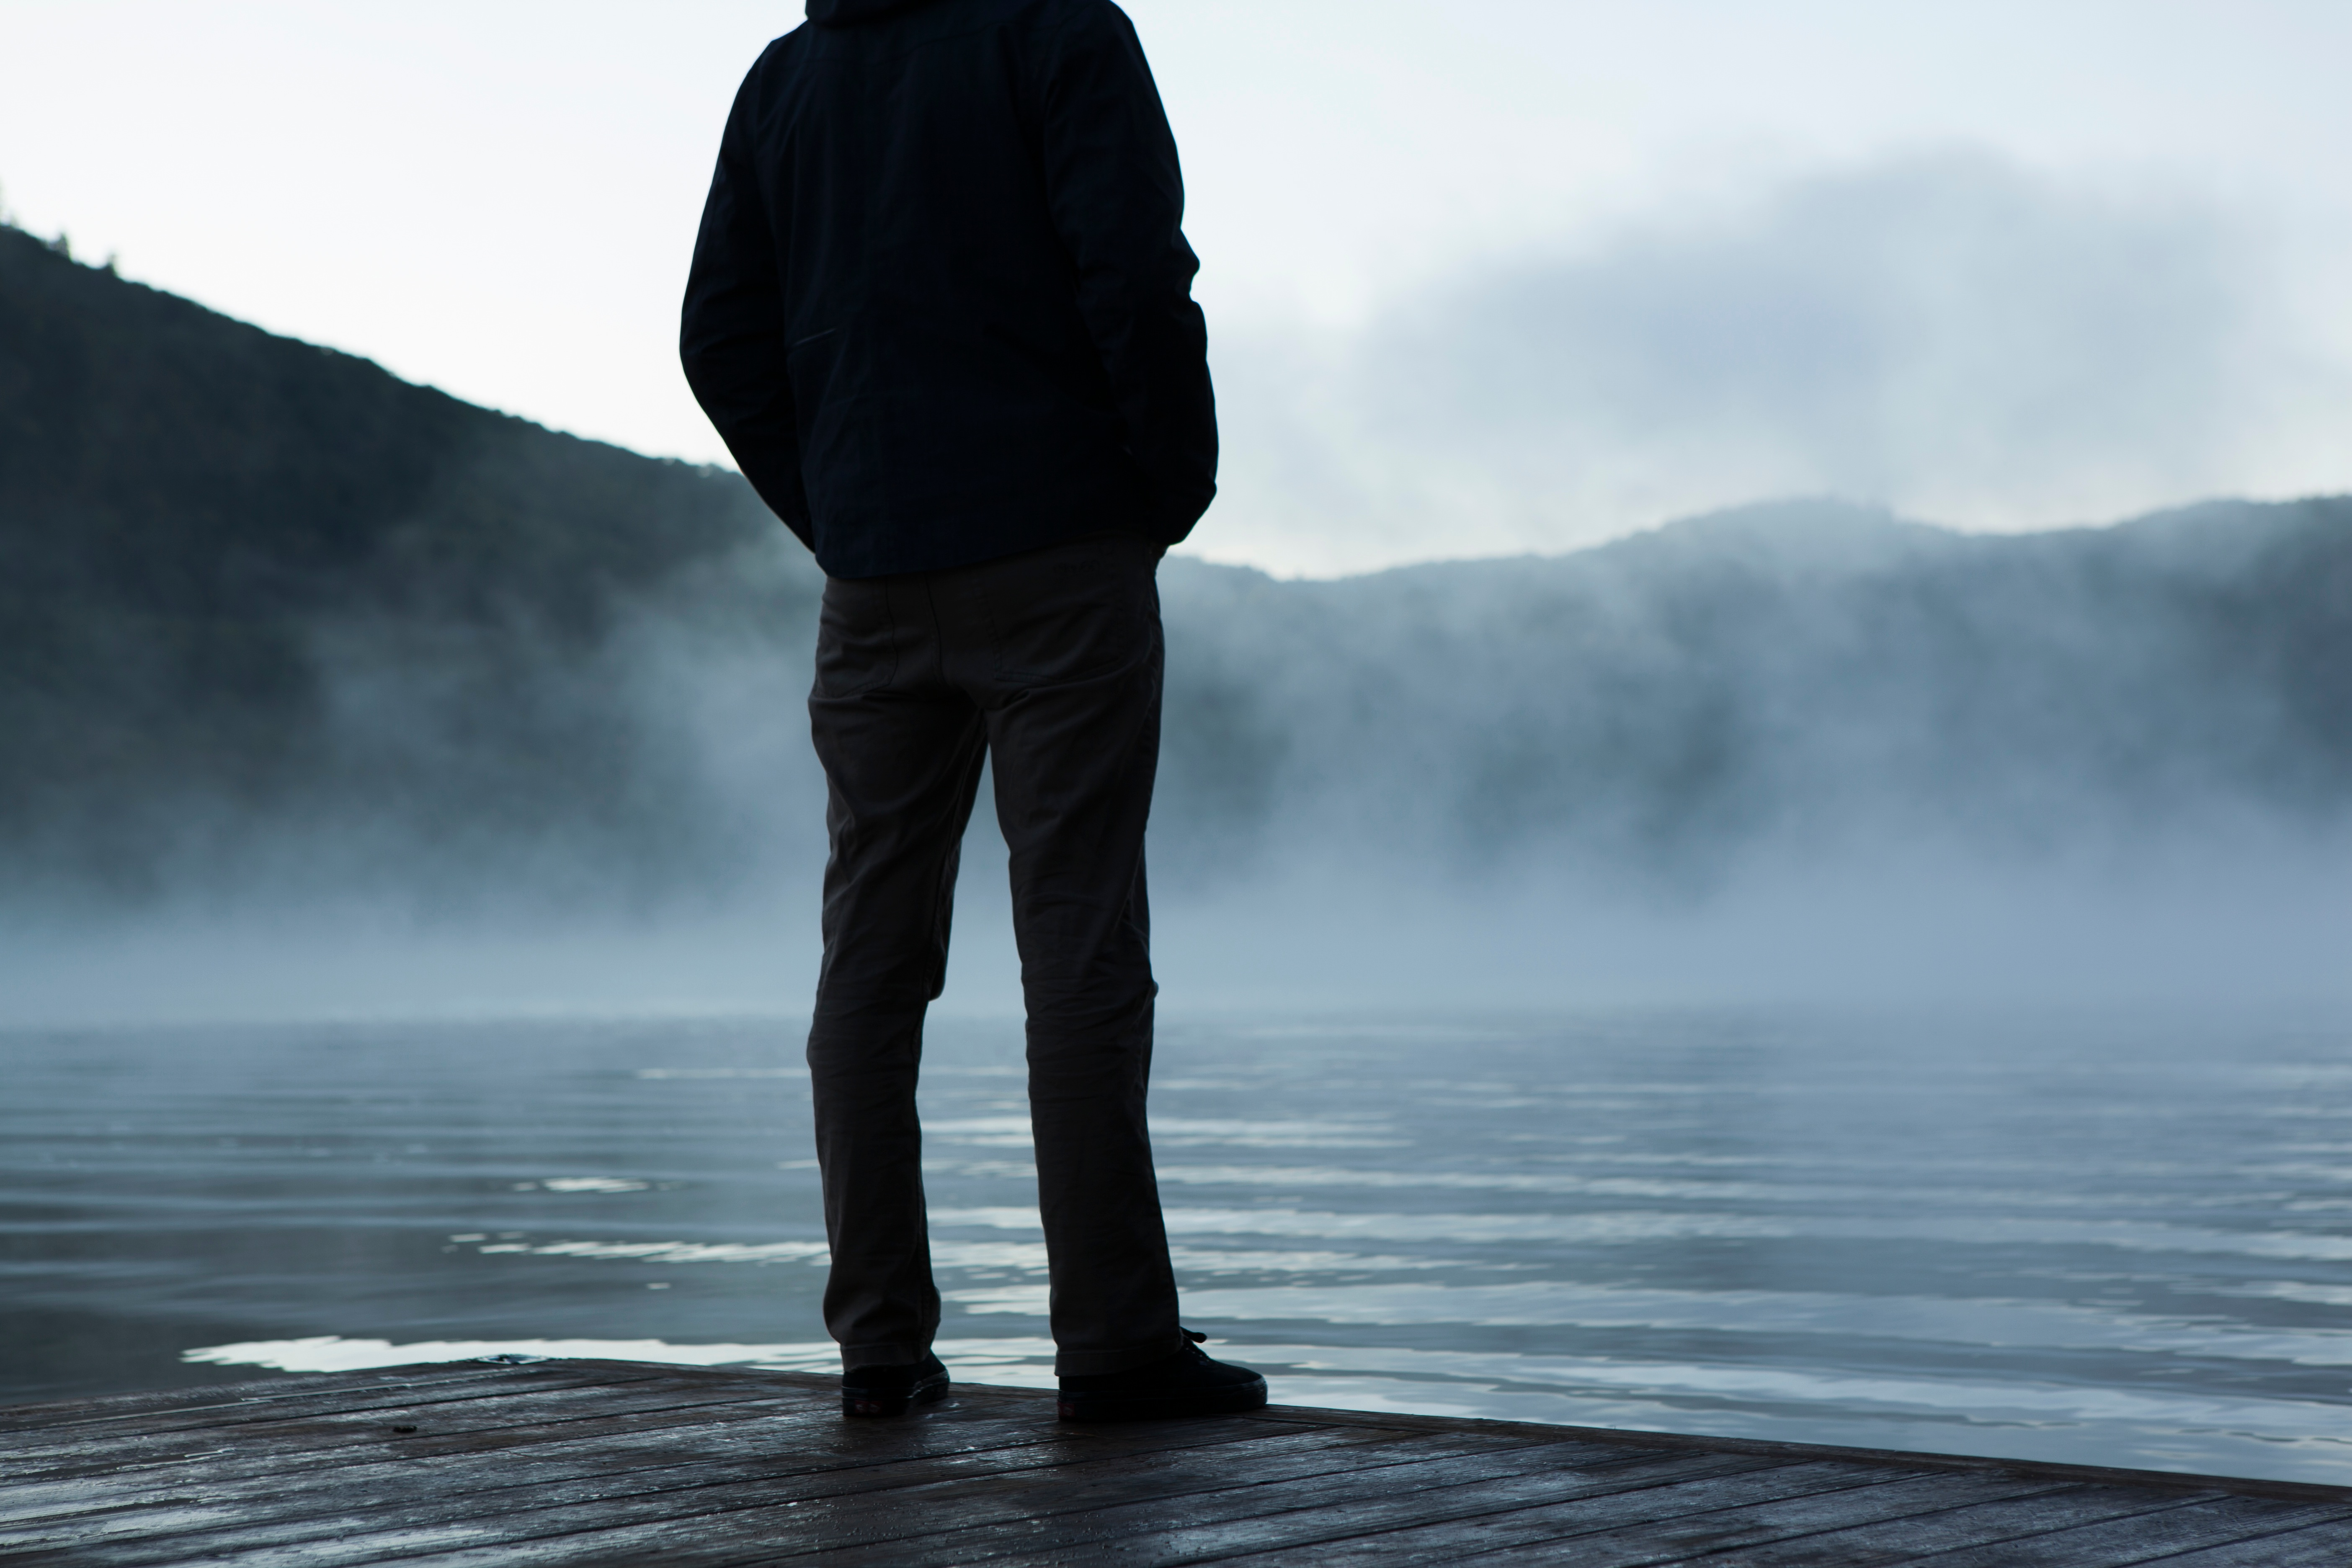 man standing on dock at foggy lake